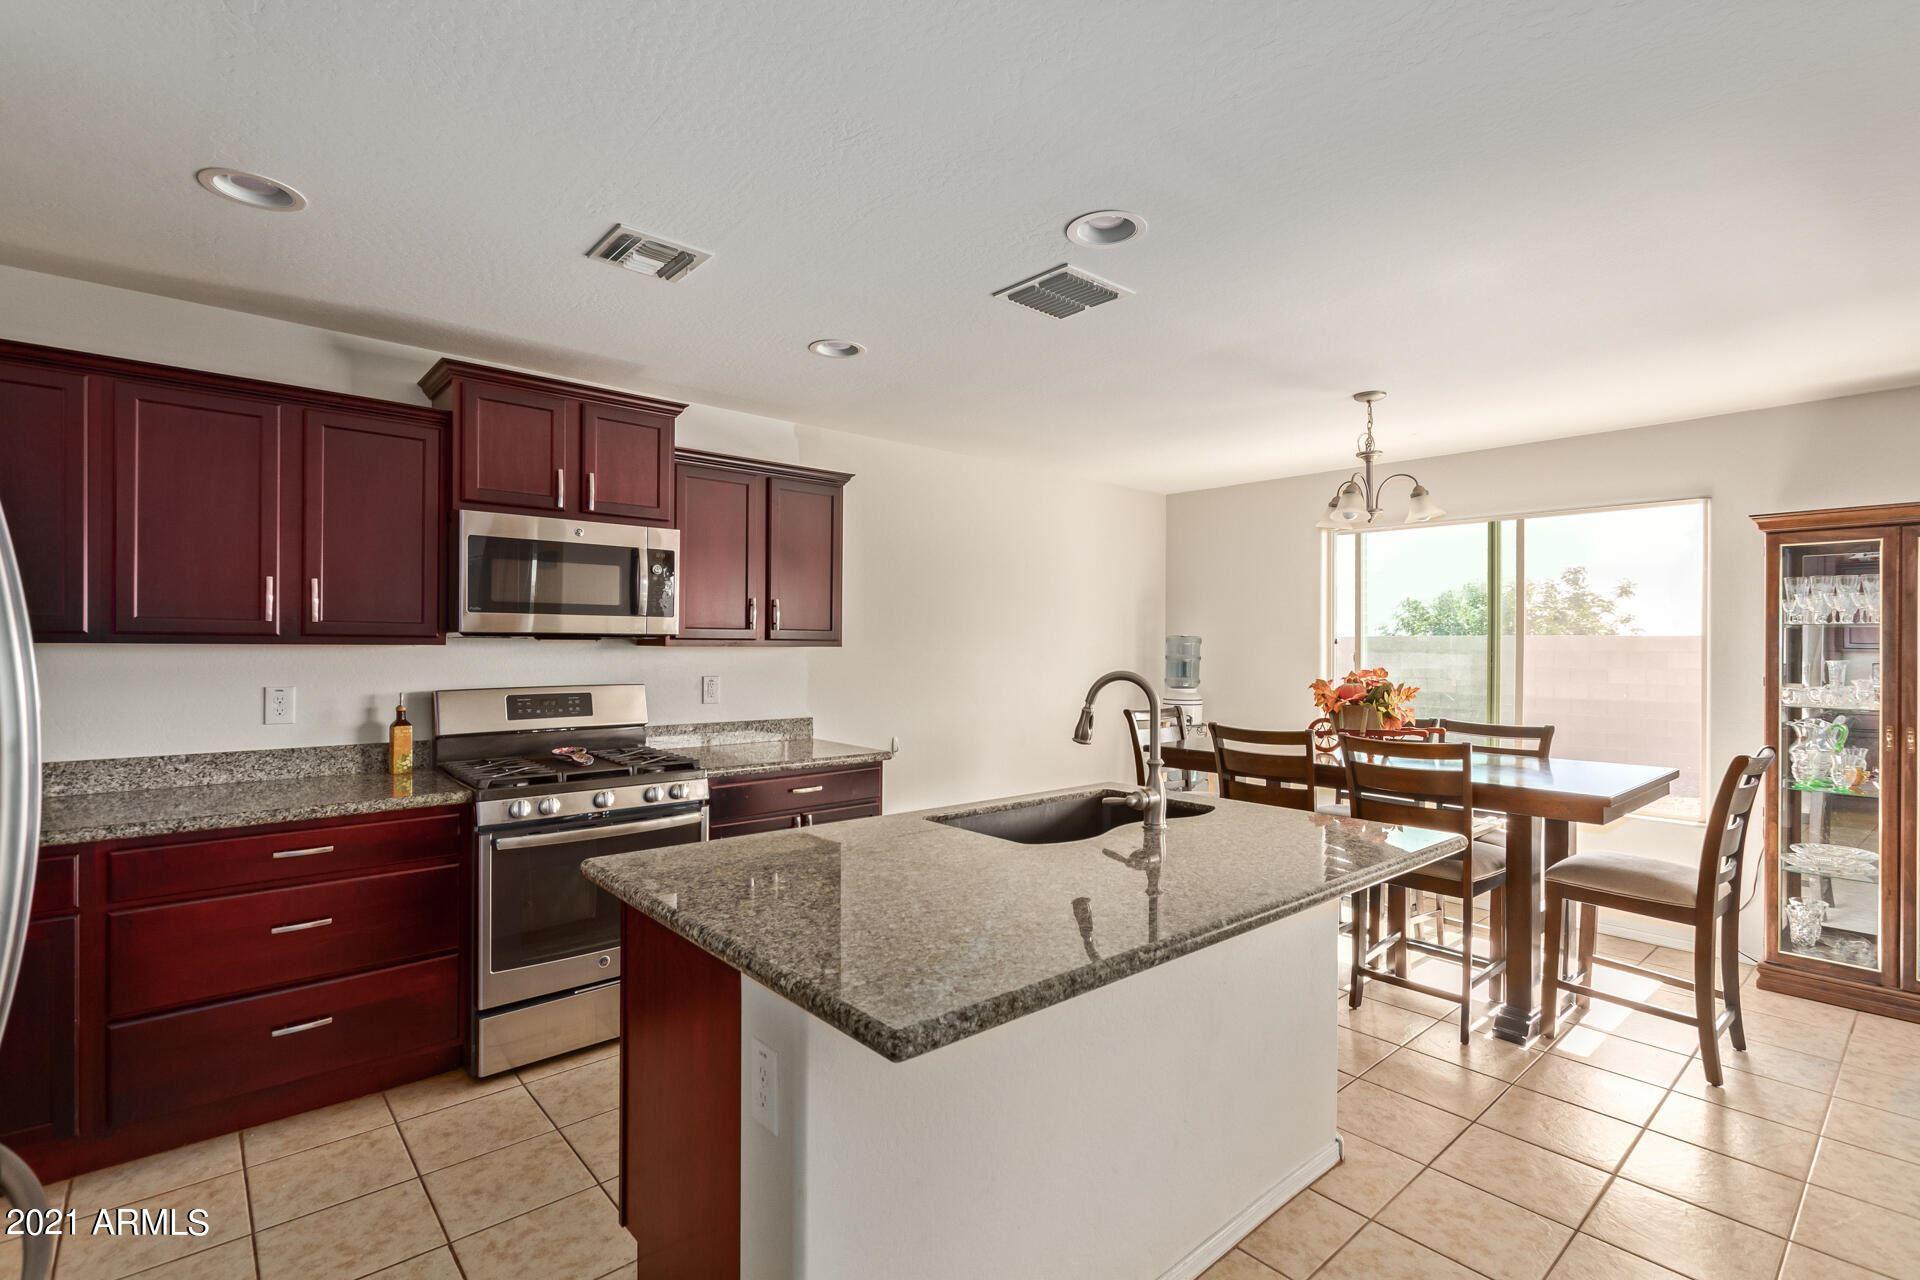 Photo of 18563 W PUEBLO Avenue, Goodyear, AZ 85338 (MLS # 6307047)